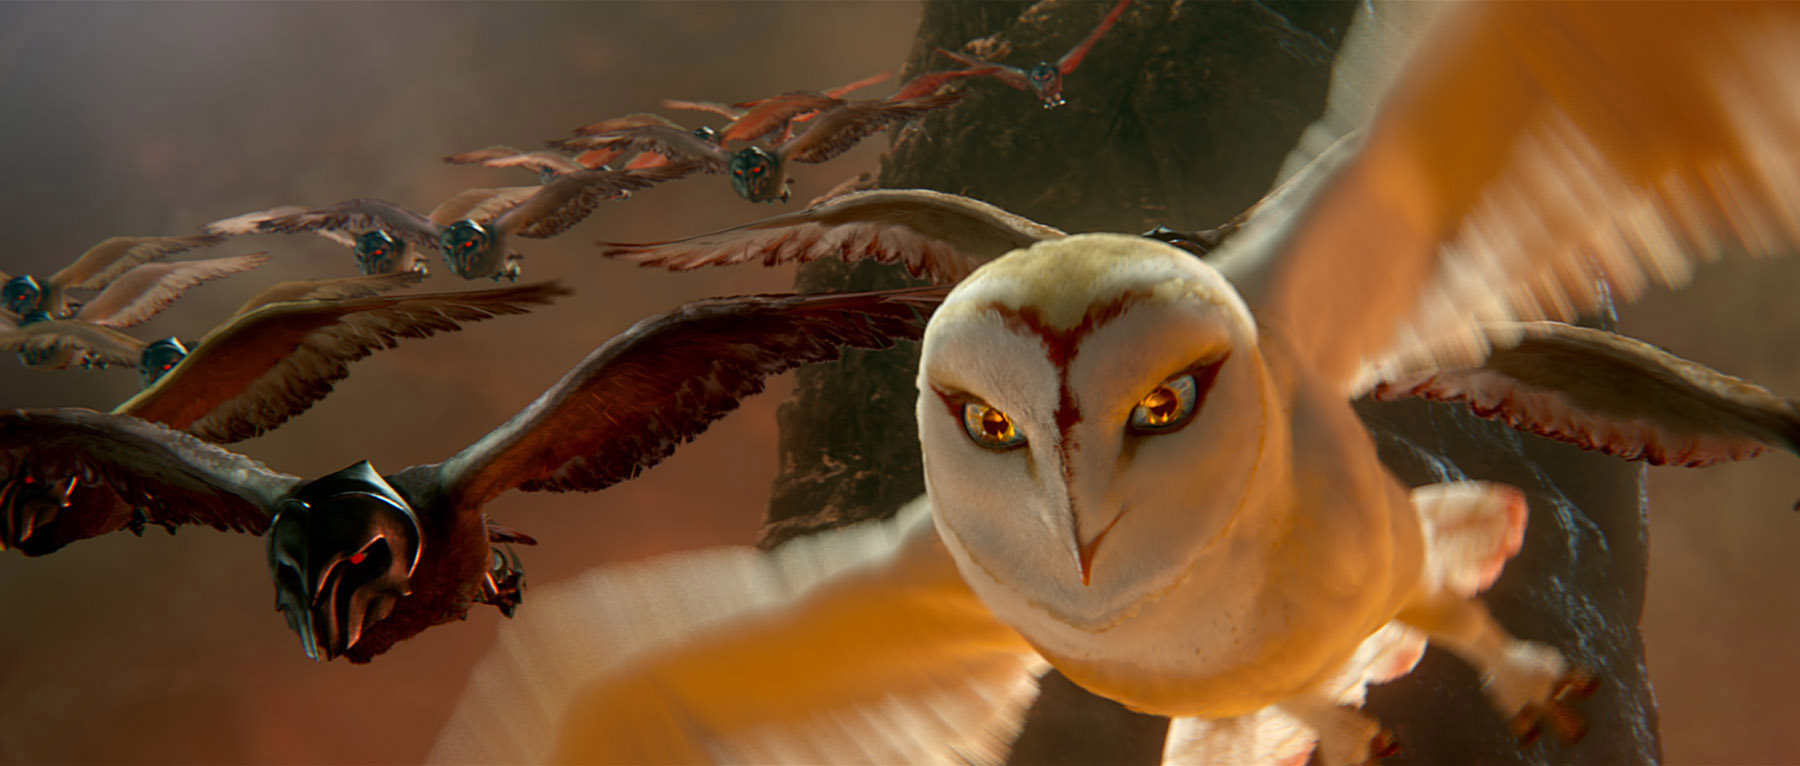 2010 legend of the guardians the owls of ga hoole 021.jpgFan Feed